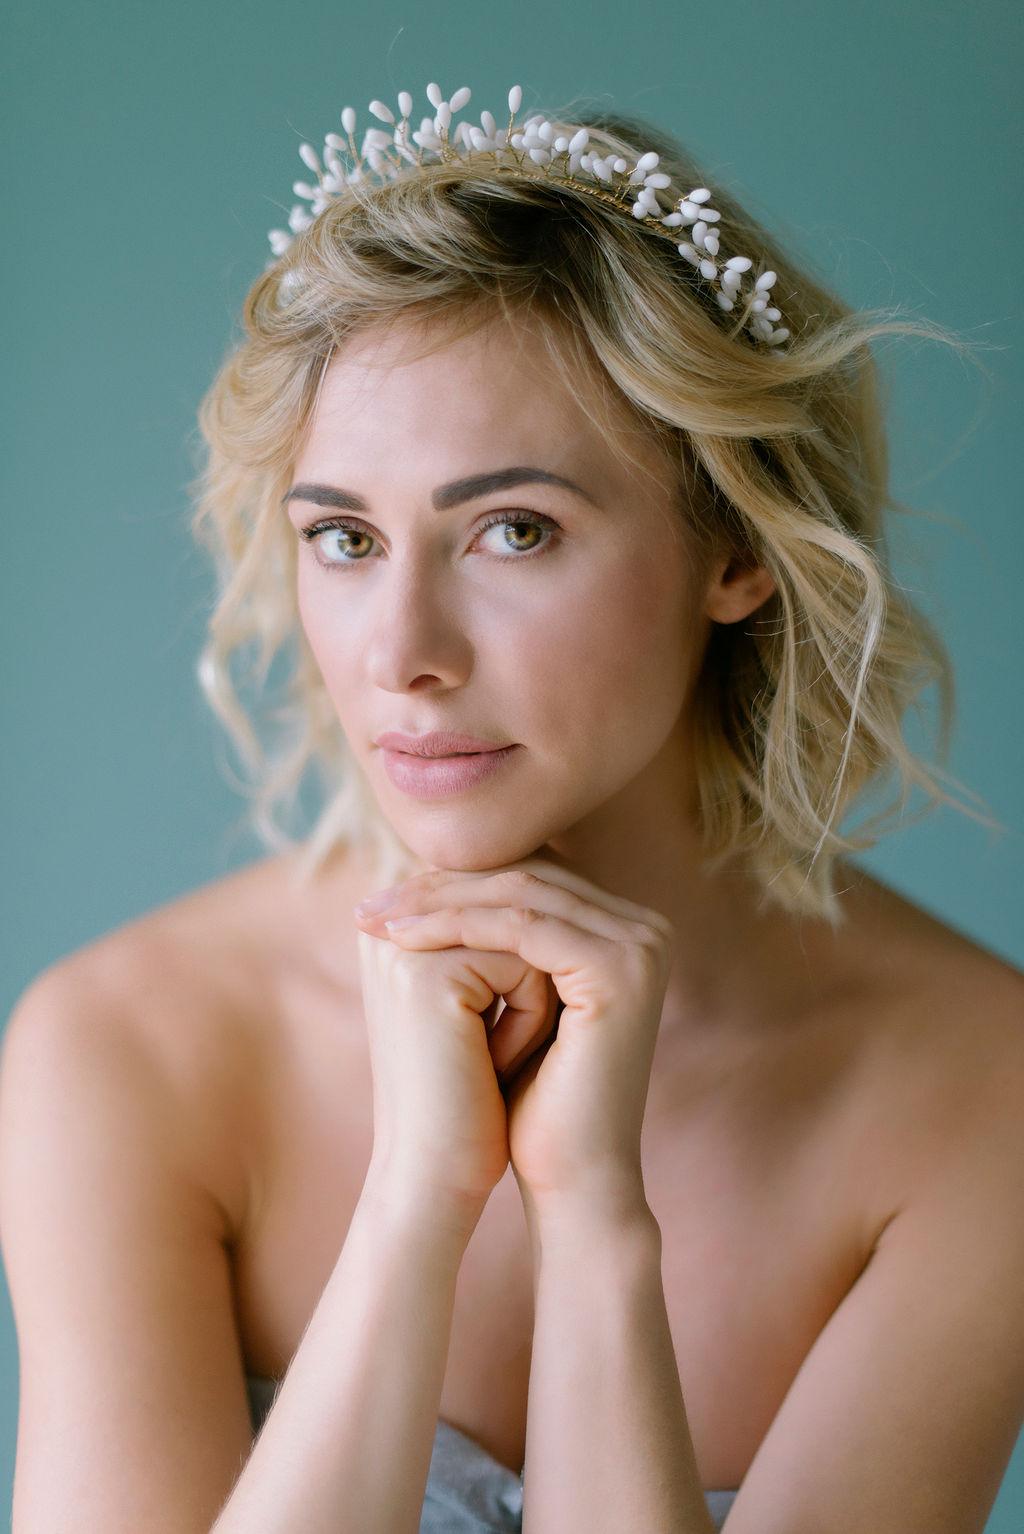 FashioneditorialSabben-Bo&luca-EmmanuelleMarty-webPhotography-20